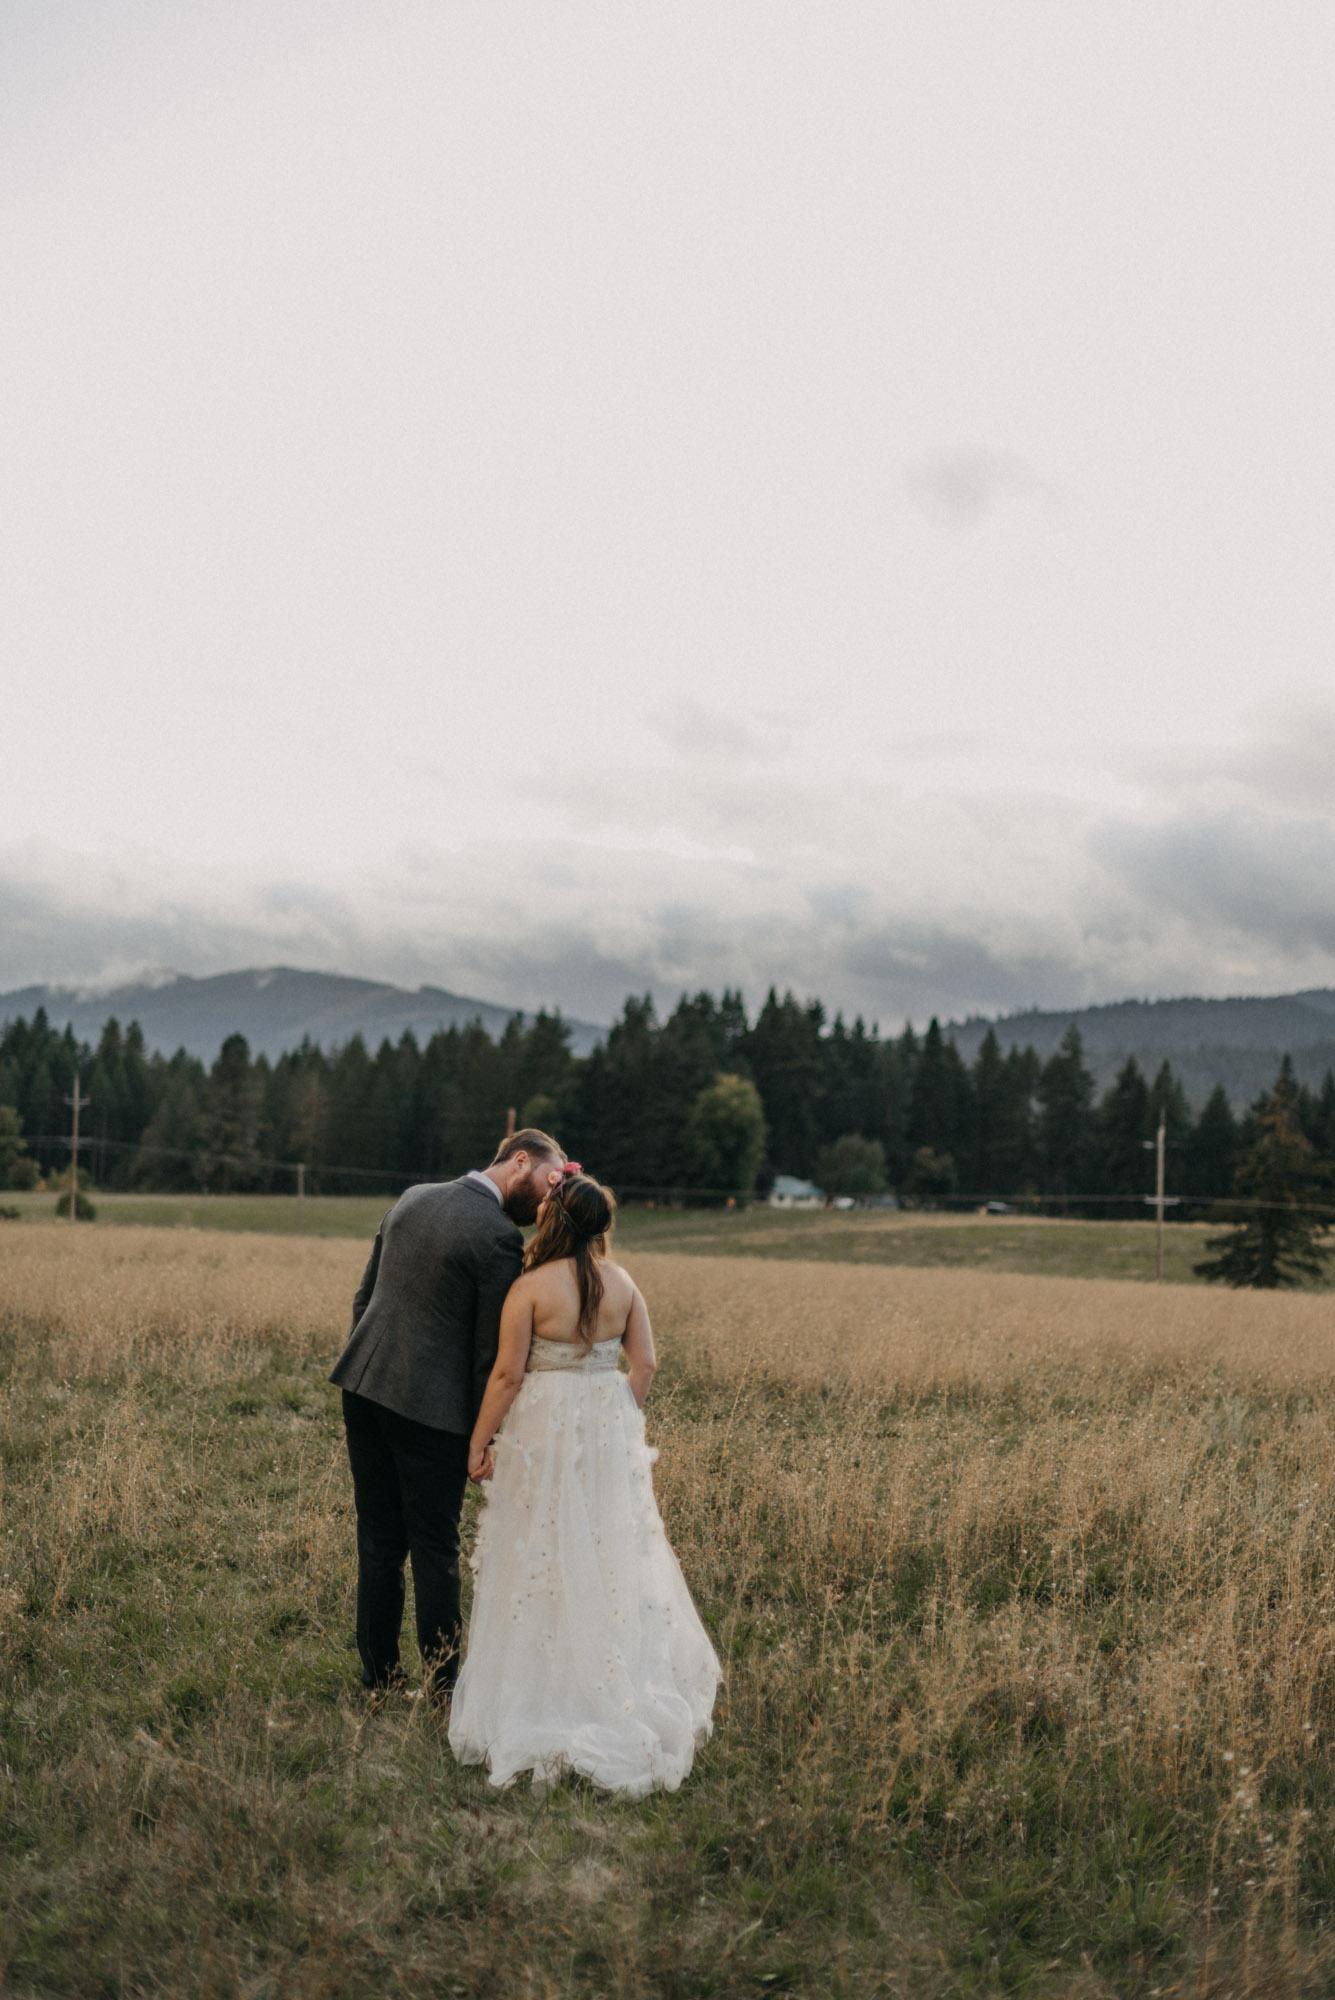 Portland-Washington-Wedding-Photographer-Outdoor-9590.jpg